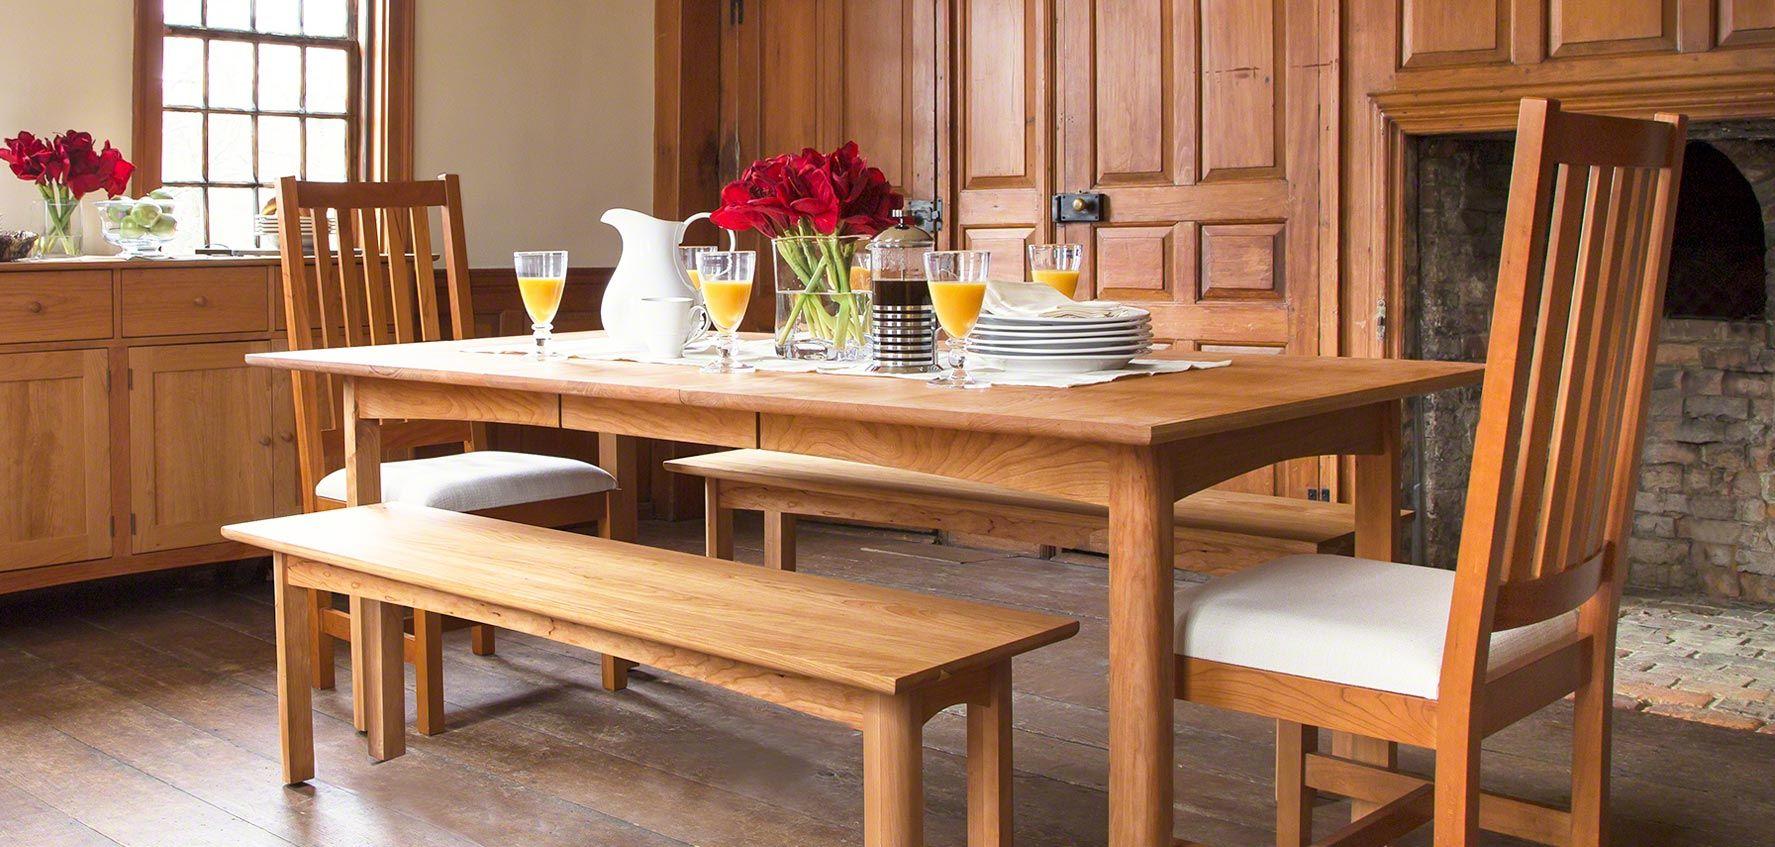 simplicity and elegance wonderful appearance on shaker dining rh pinterest com shaker kitchen table and chairs shaker kitchen table and chairs